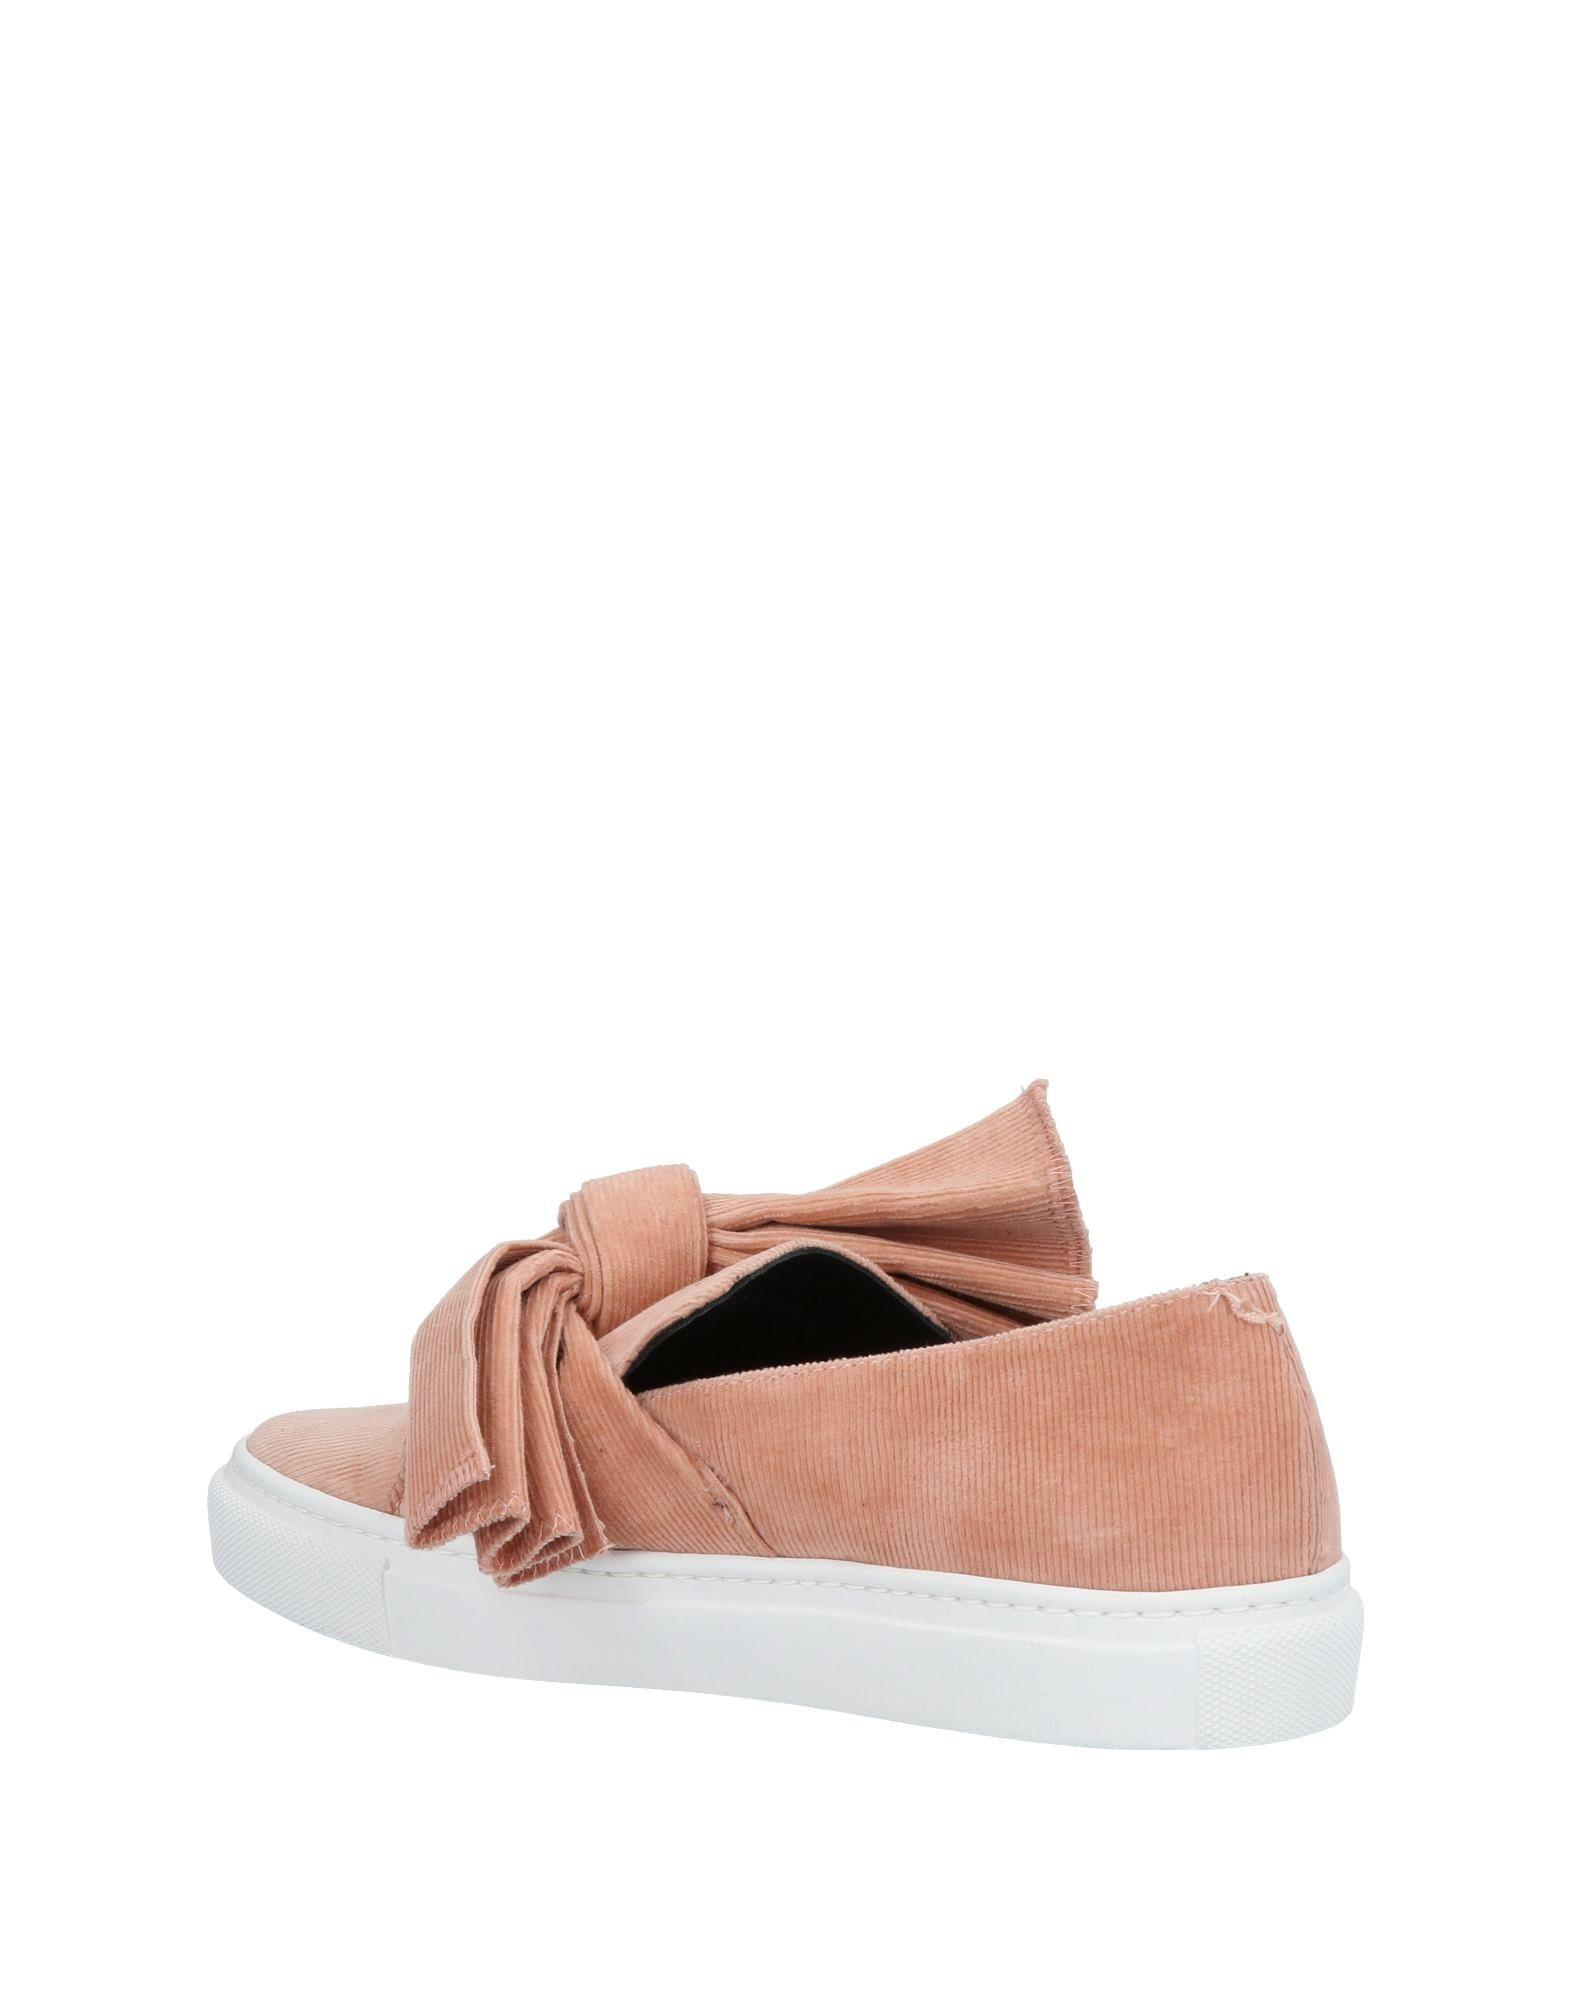 Cedric Charlier Corduroy Low-tops & Sneakers in Pale Pink (Pink)